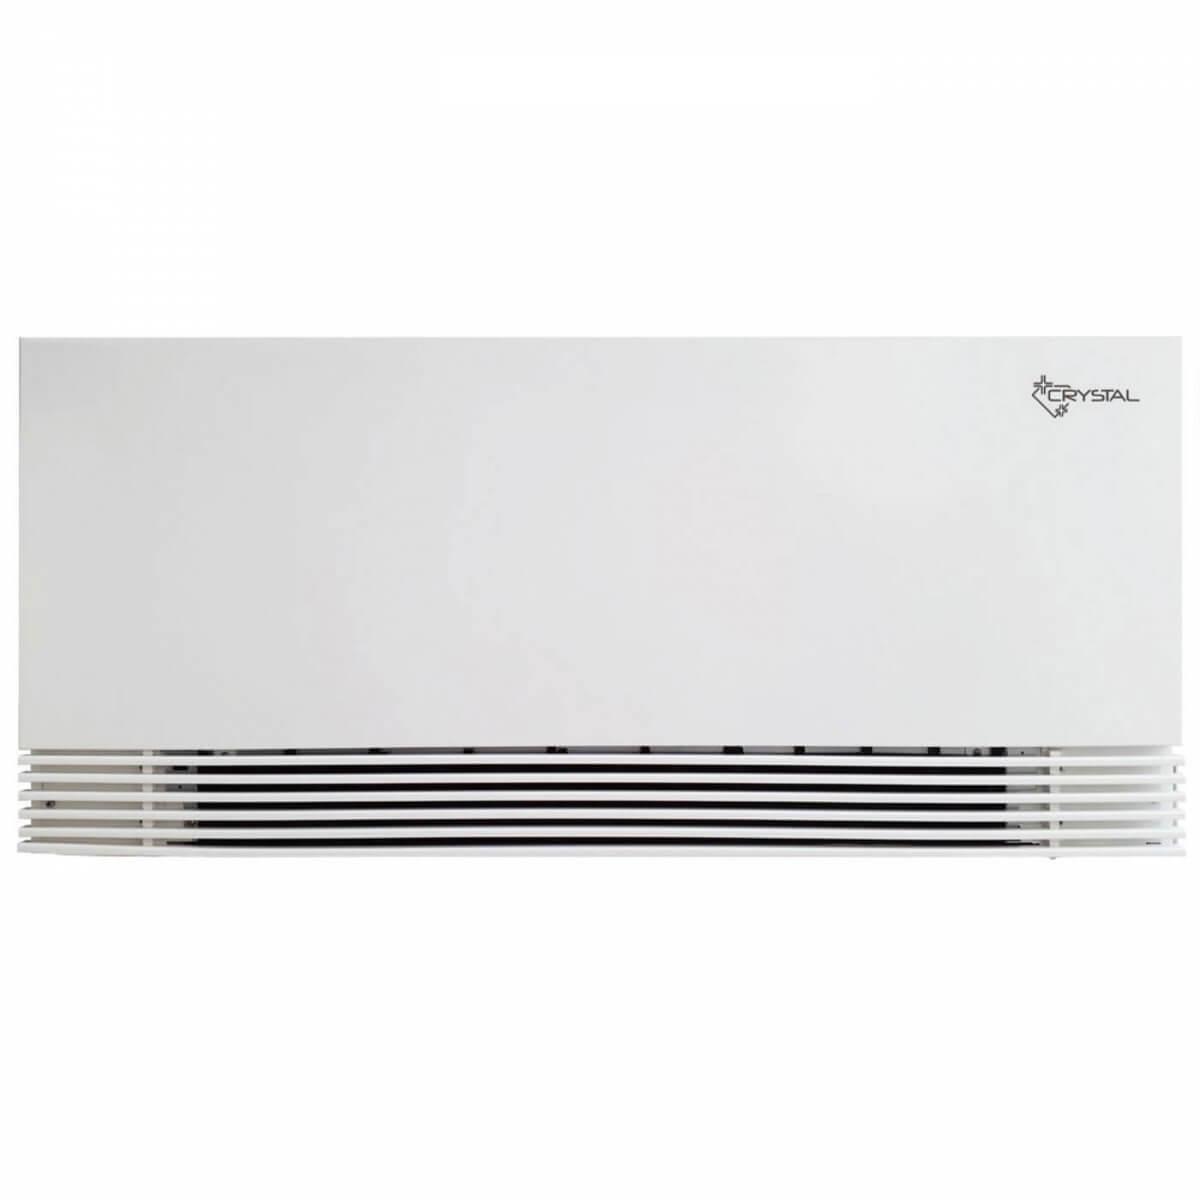 Вентилаторен конвектор Crystal BGR-800 L/R - 3